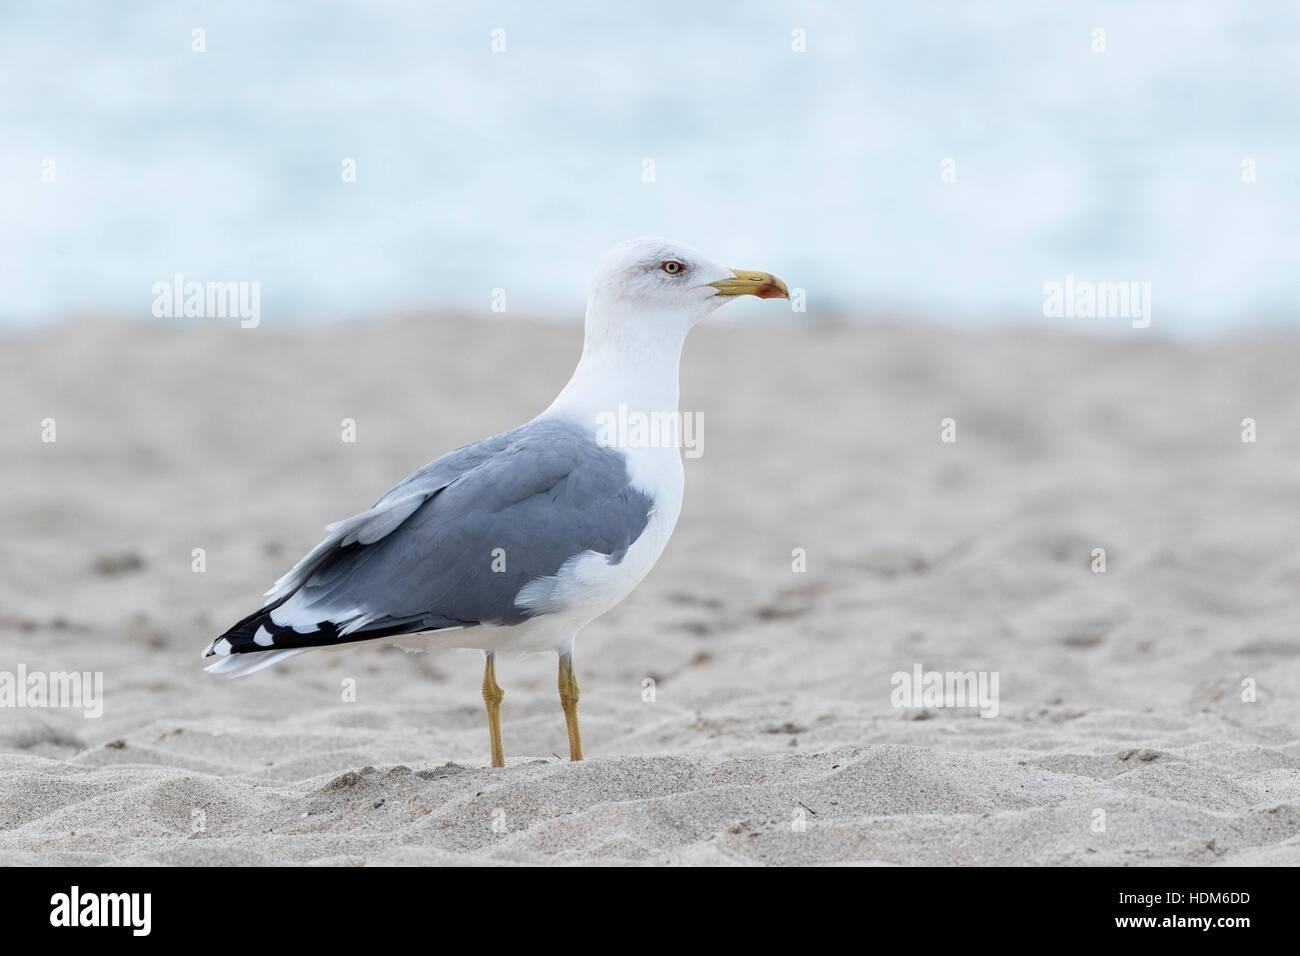 yellow-legged gull (Larus micahelis) adult standing on beach, Mallorca, Balearic Islands, Spain - Stock Image